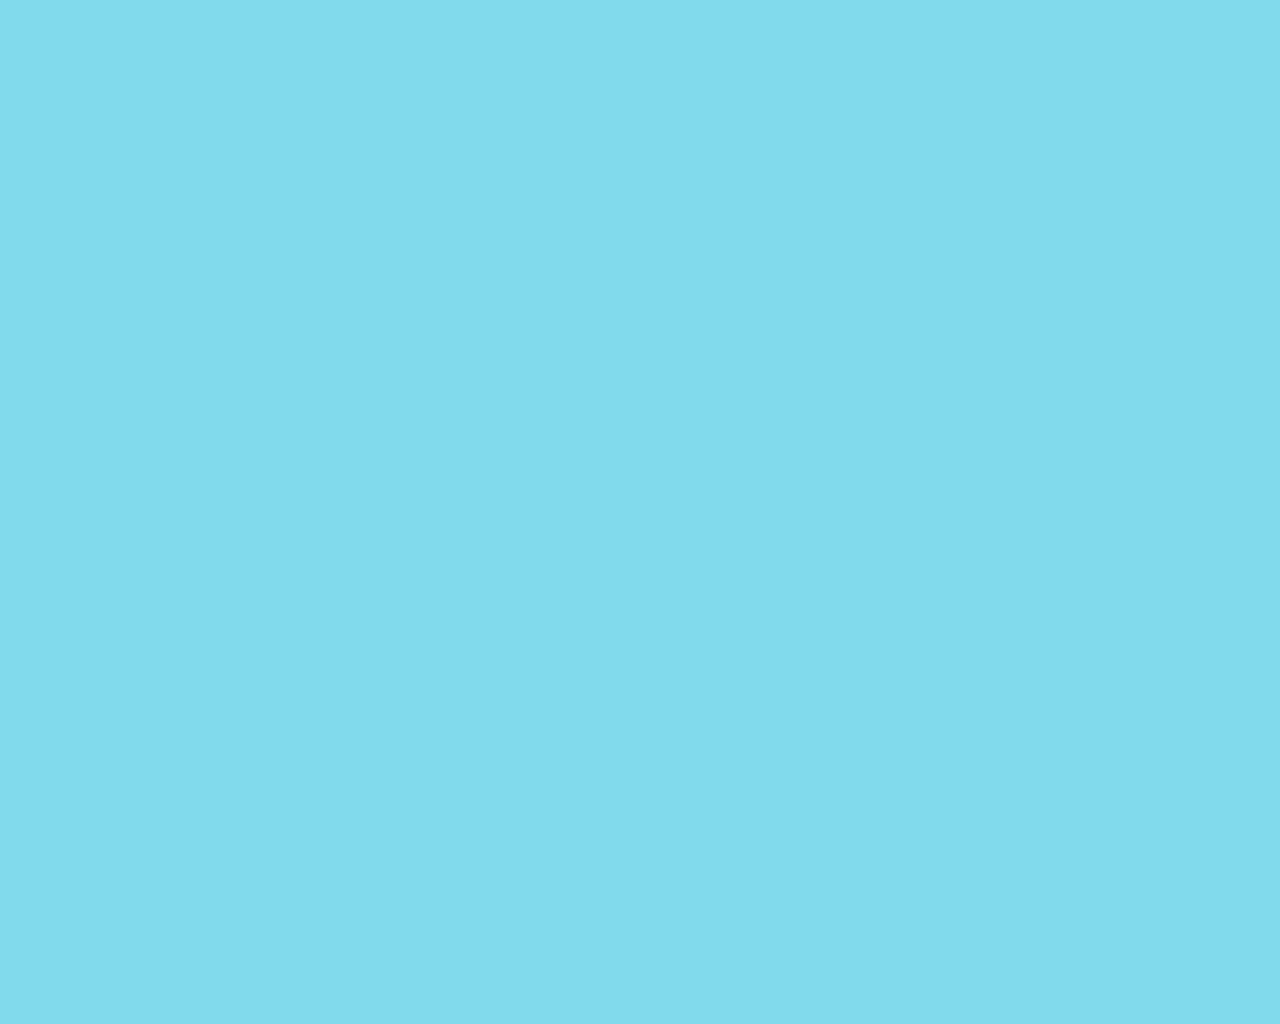 1280x1024 Medium Sky Blue Solid Color Background